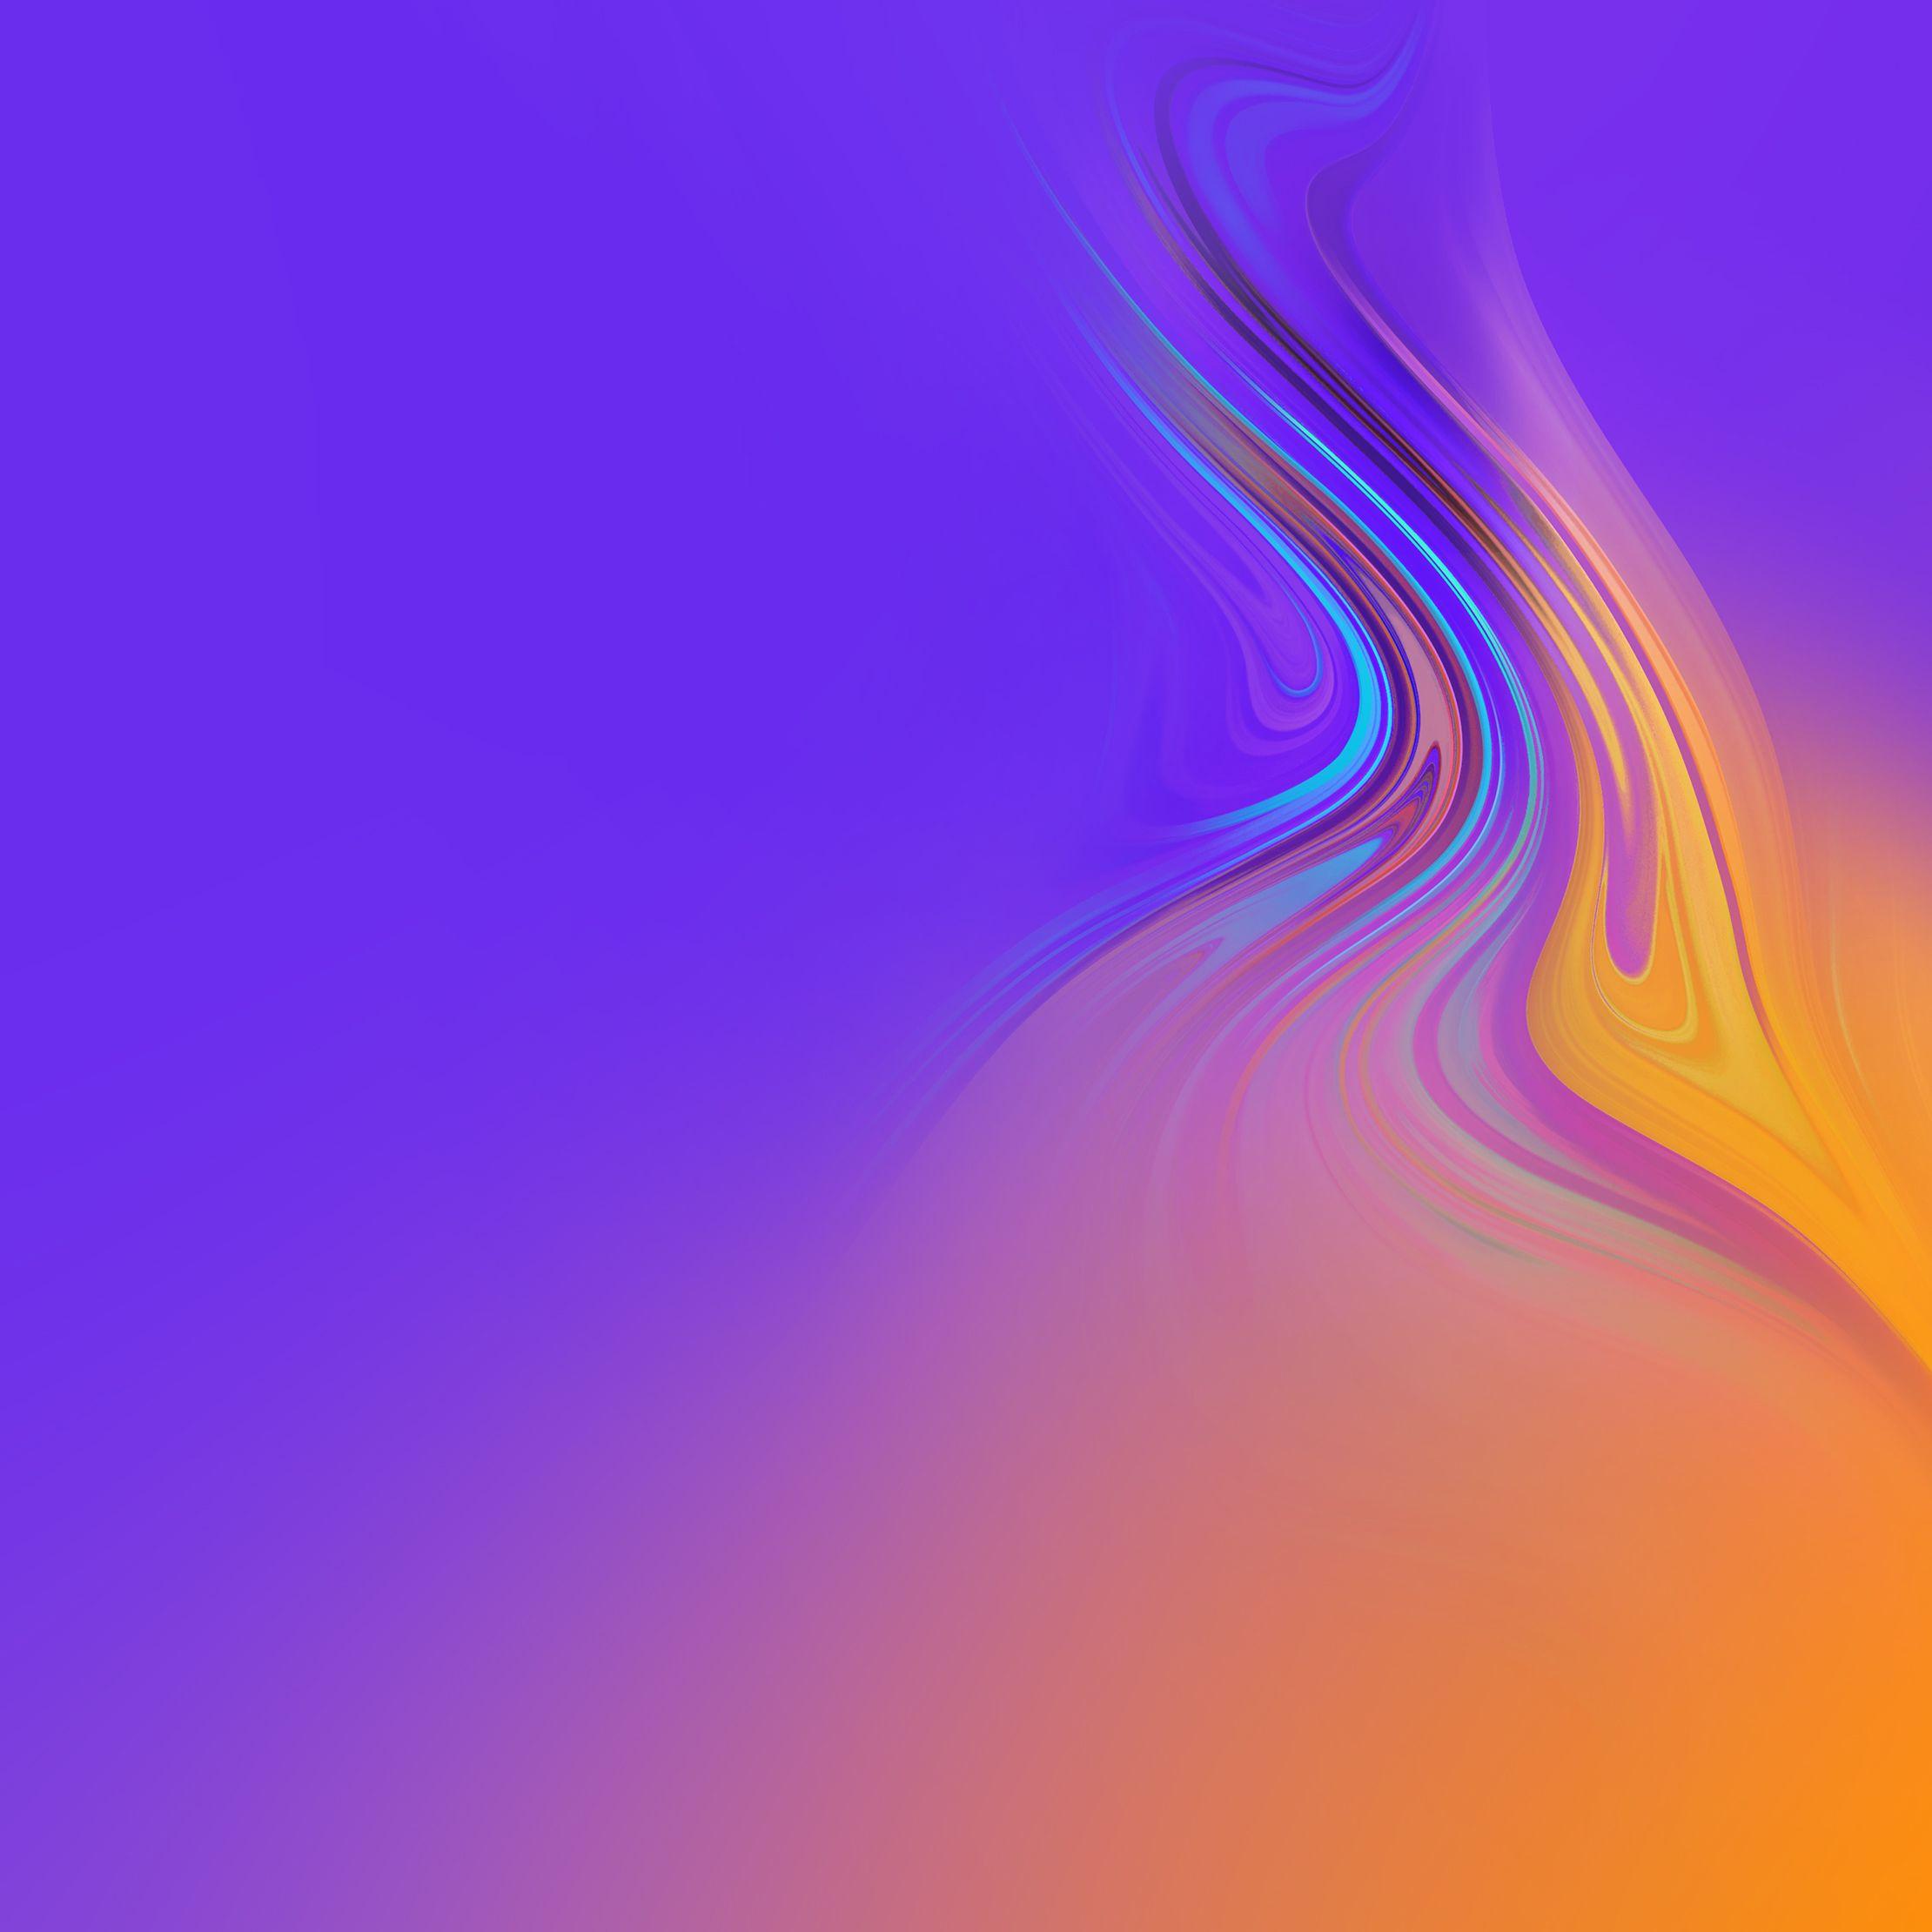 Samsung Galaxy A7 2018 Stock Wallpapers HD 2220x2220